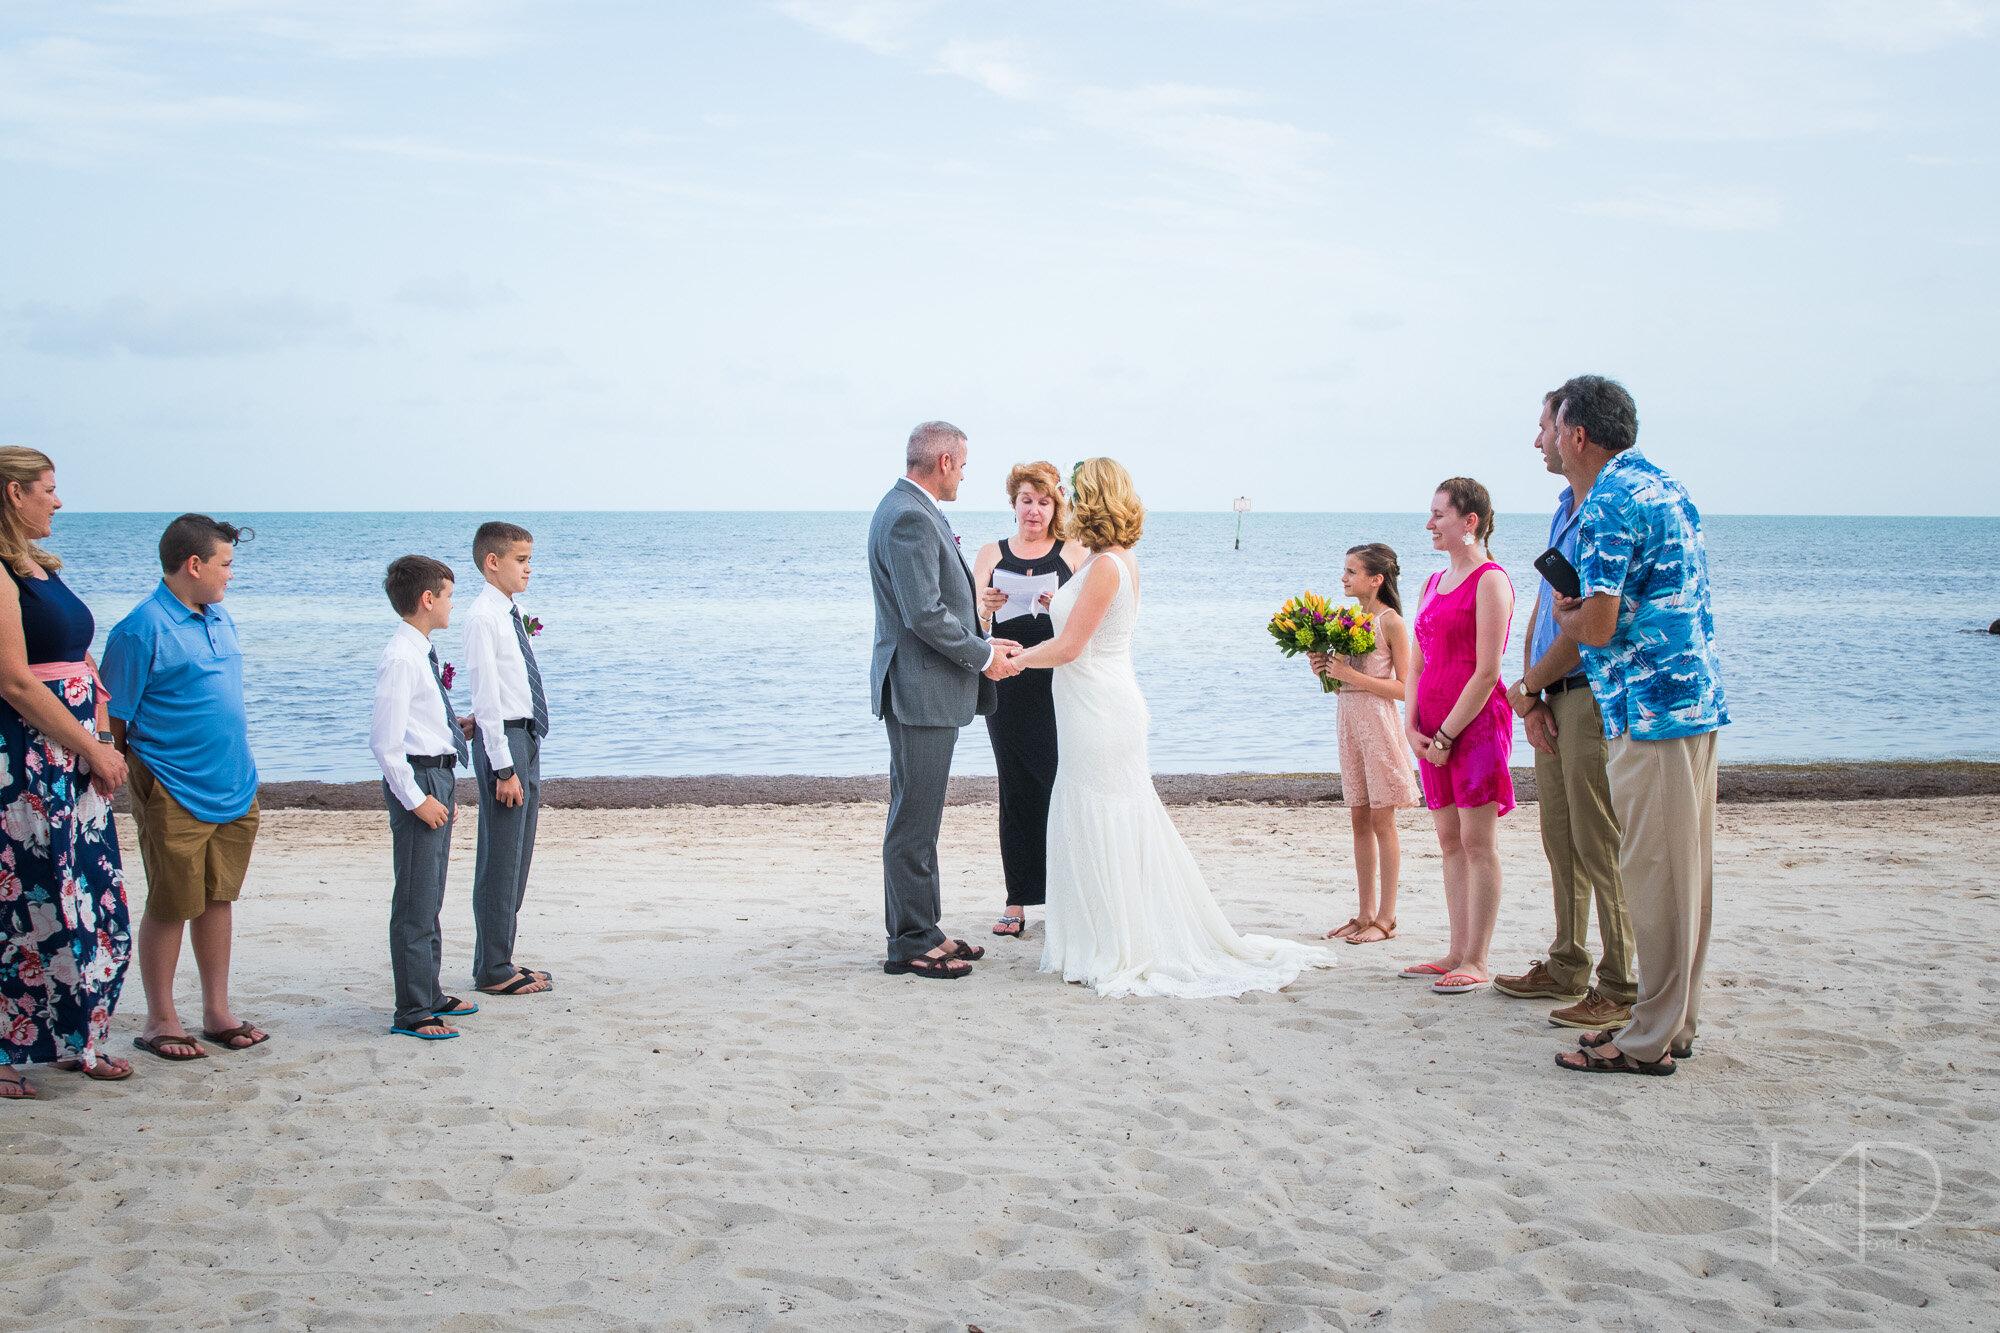 Key West photographer Karrie Porter captures bridal couple under historic fortress arches